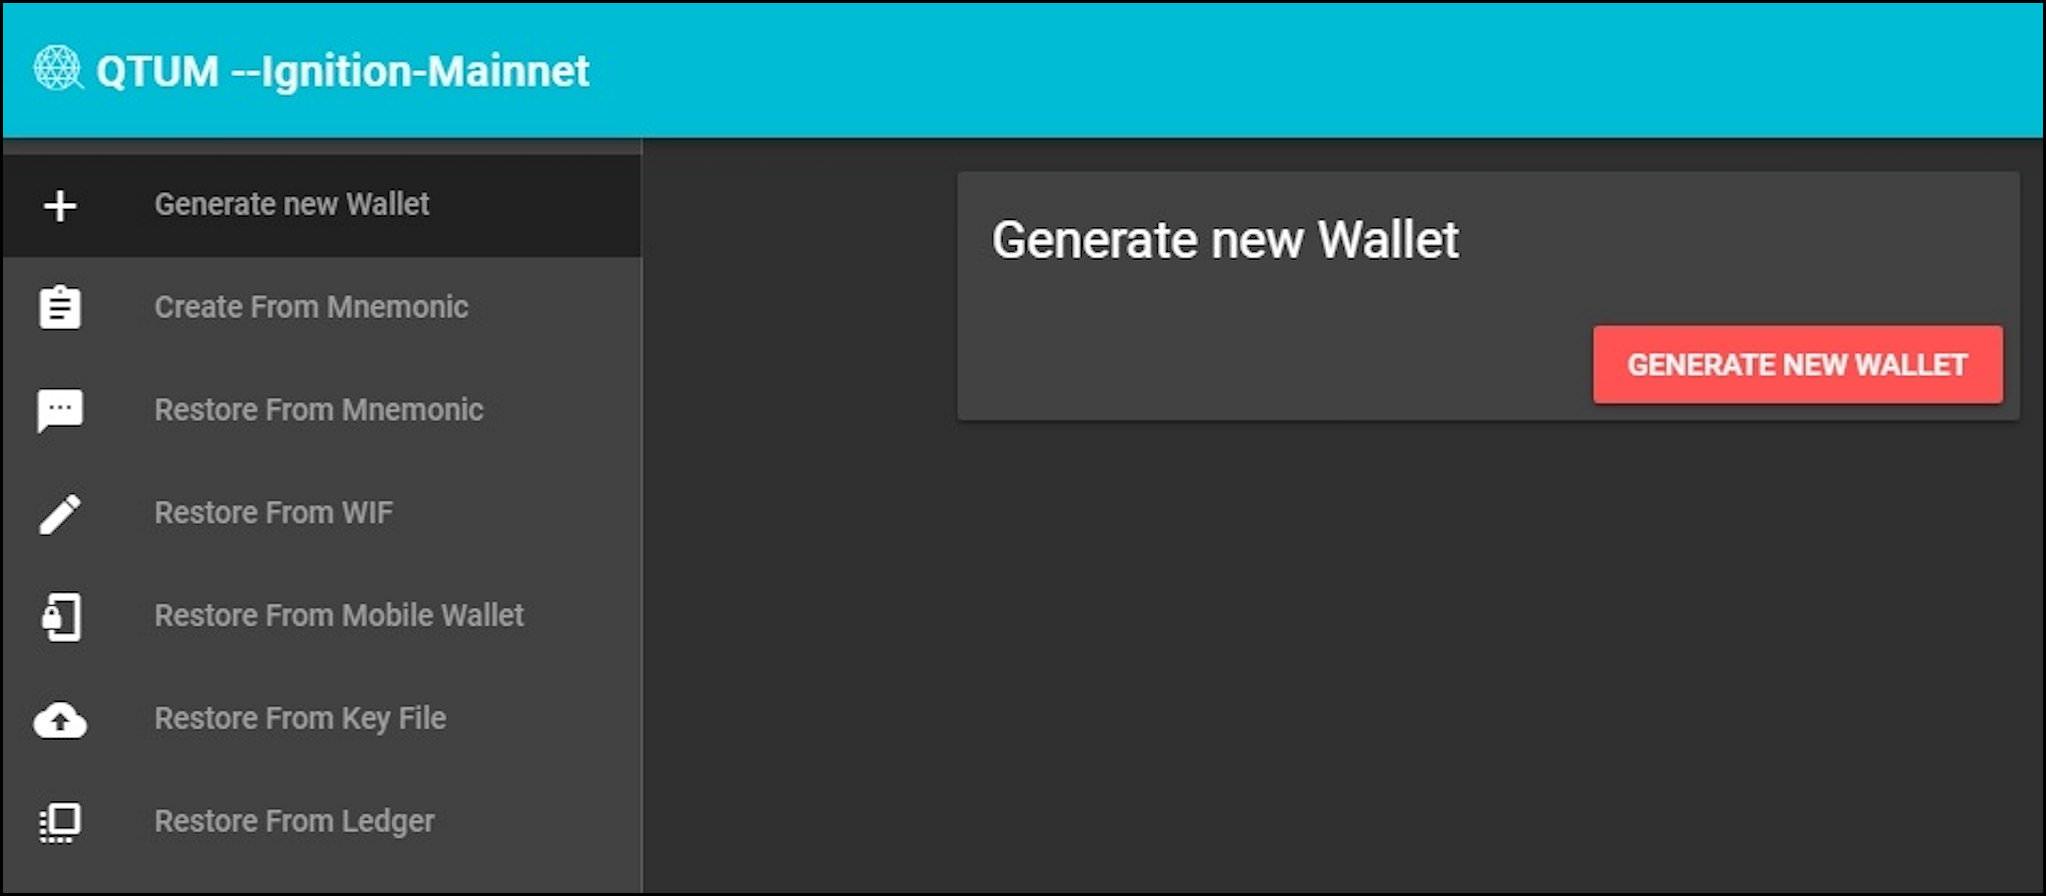 2. Generate New Wallet